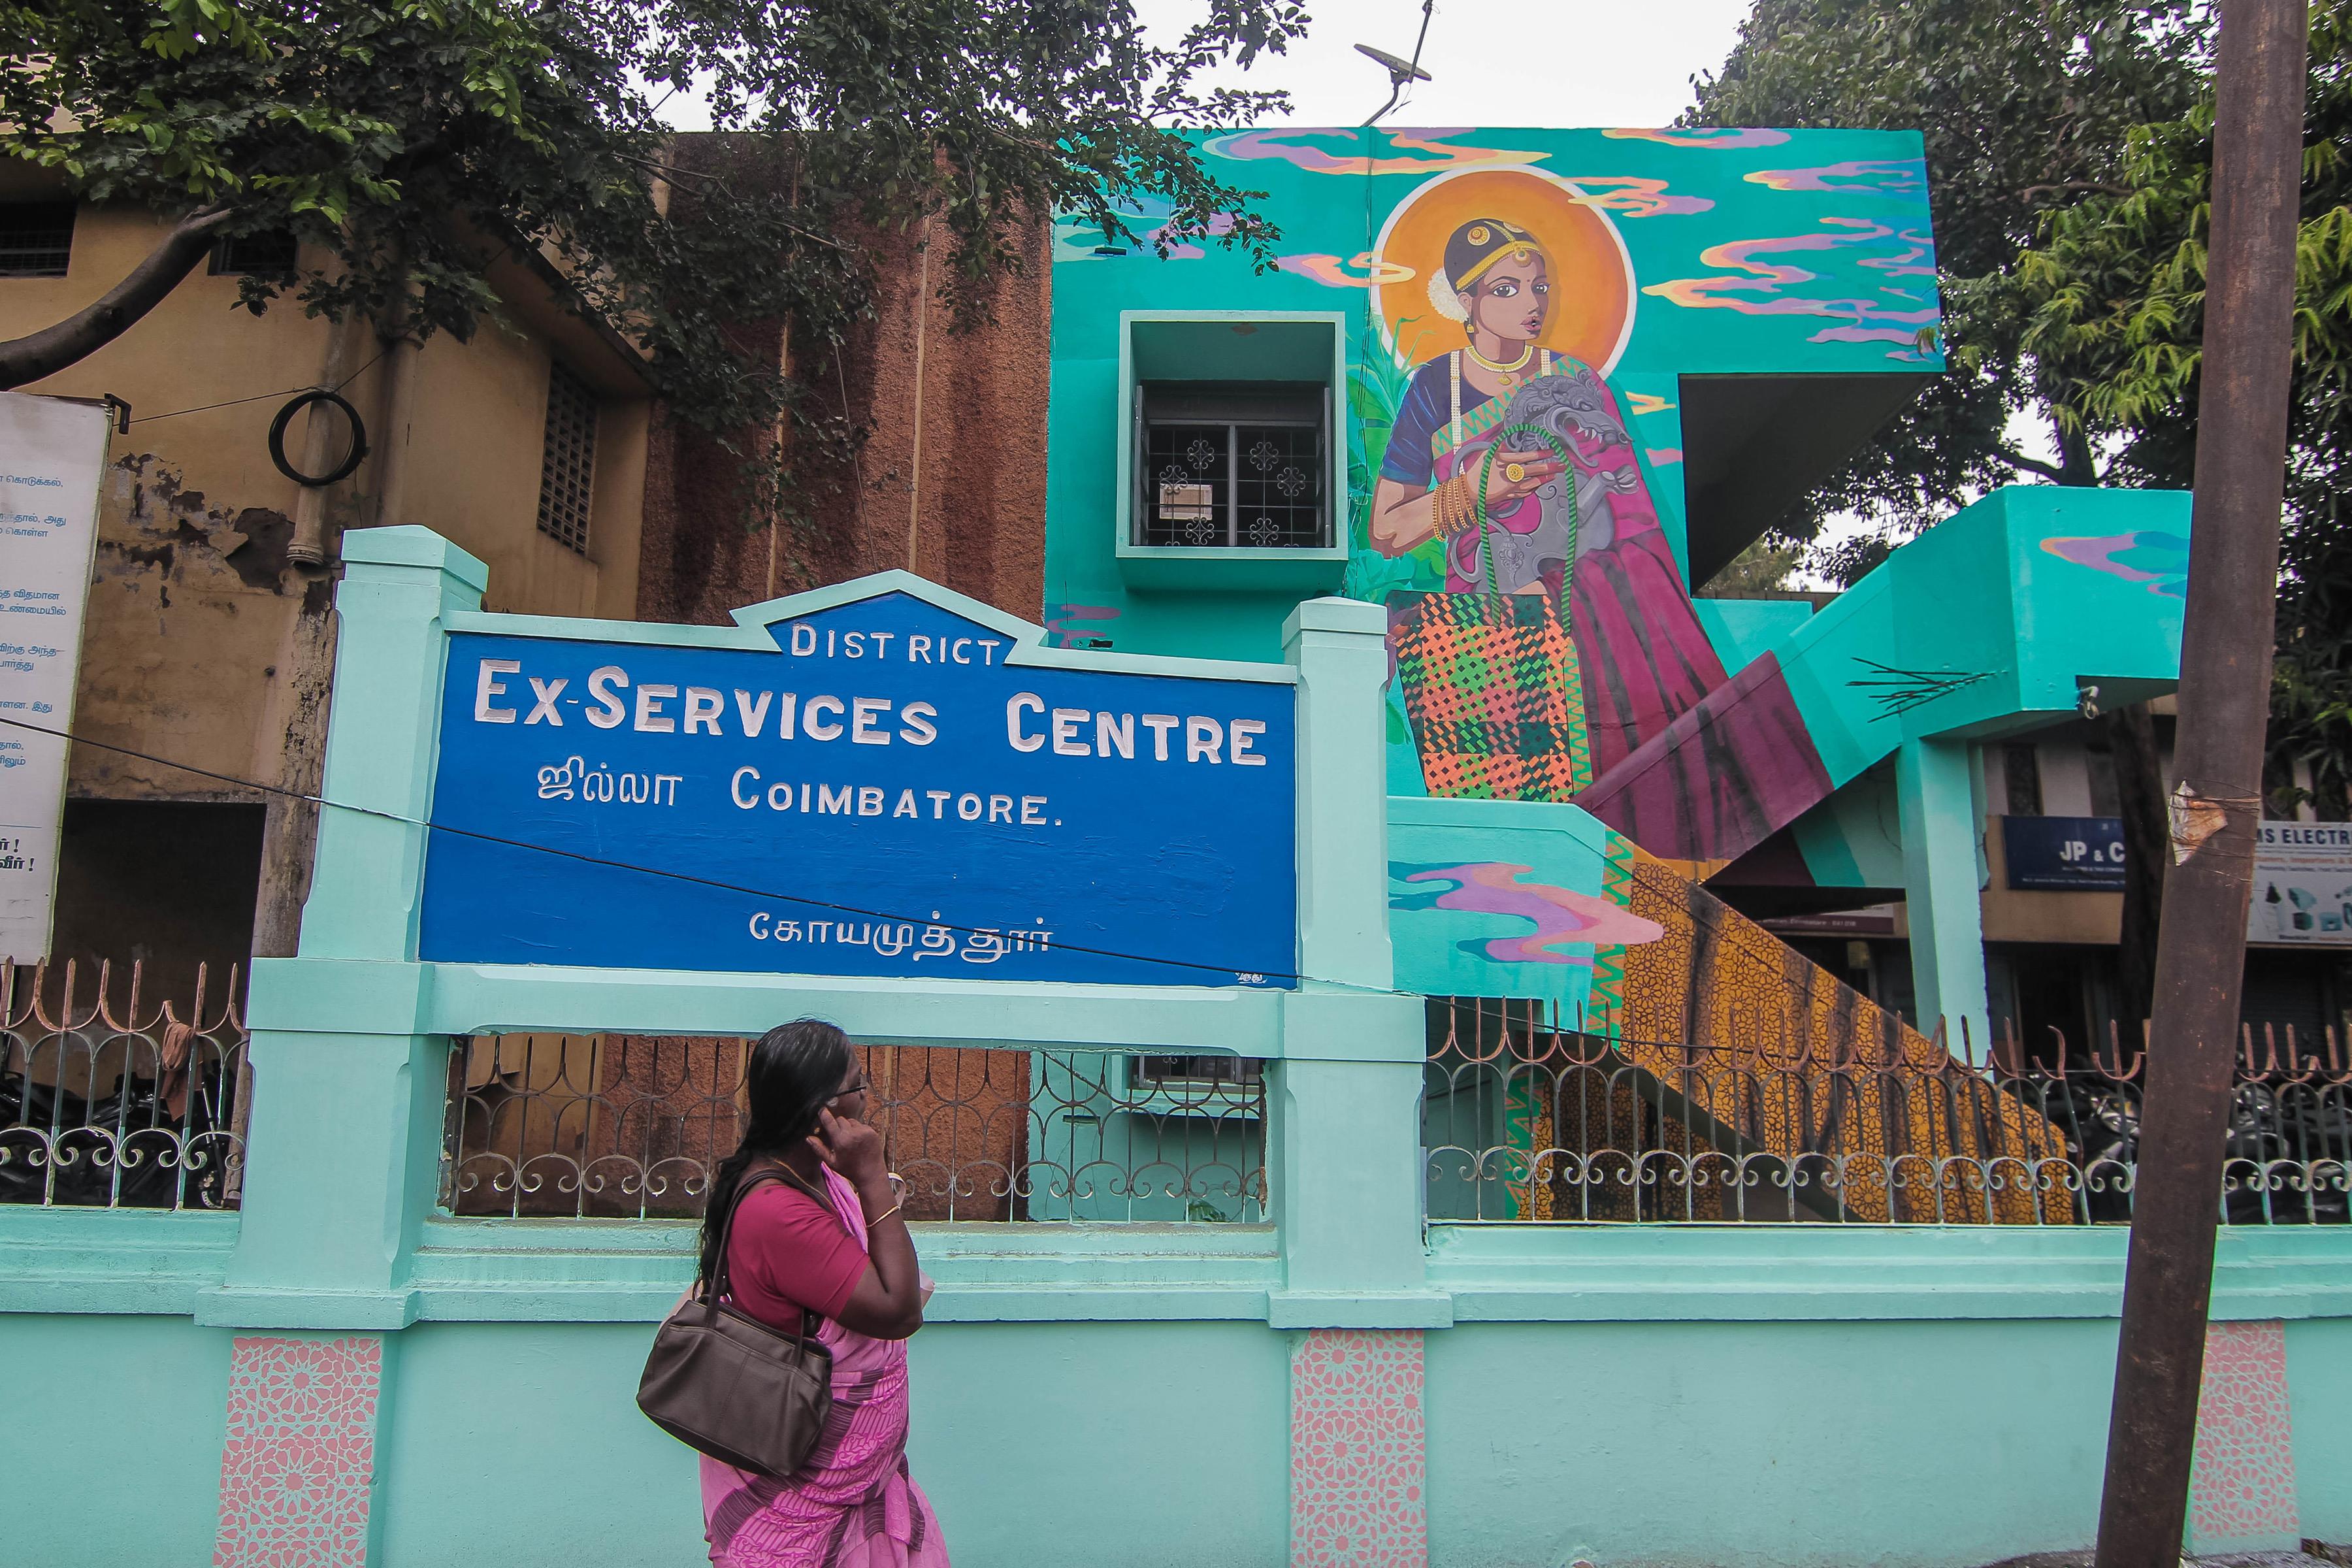 Nasto Mhoha Reveals St Art Kovai 2018 Pranav Gohil 11